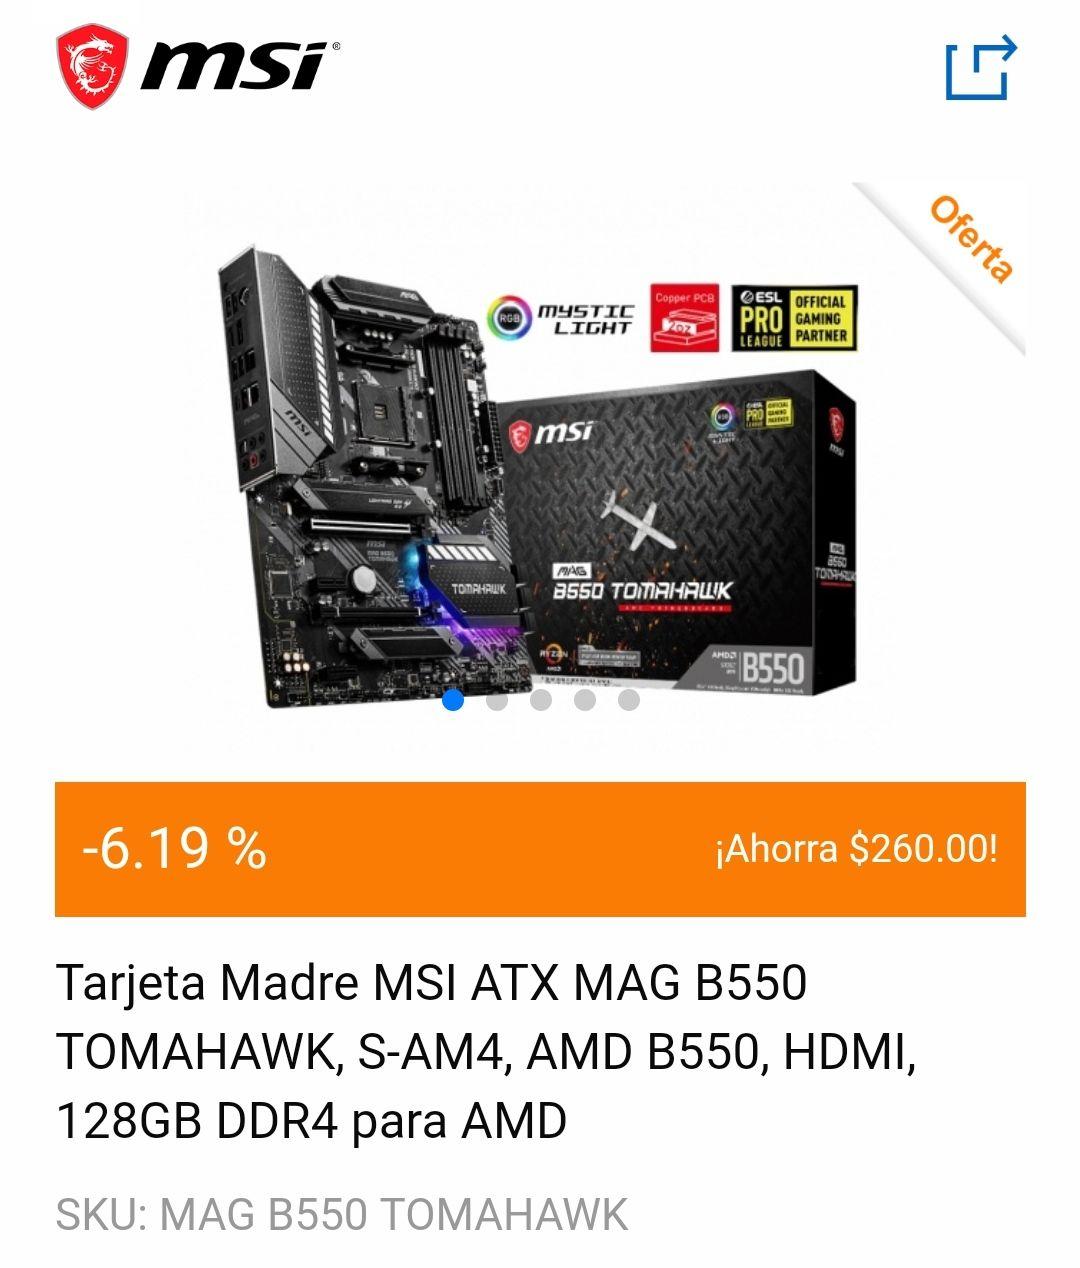 CyberPuerta: Motherboard MSI ATX MAG B550 Tomahawk